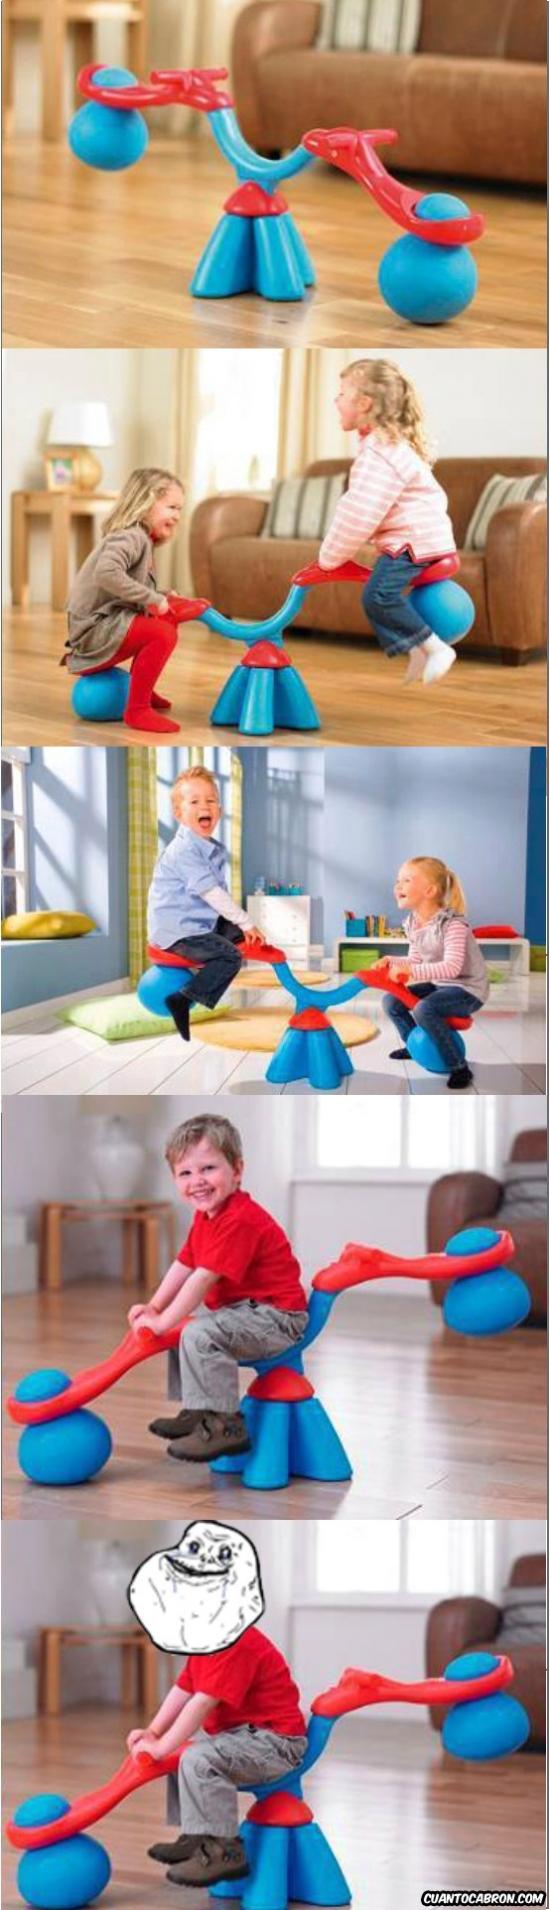 columpio,forever alone,juguete,niños